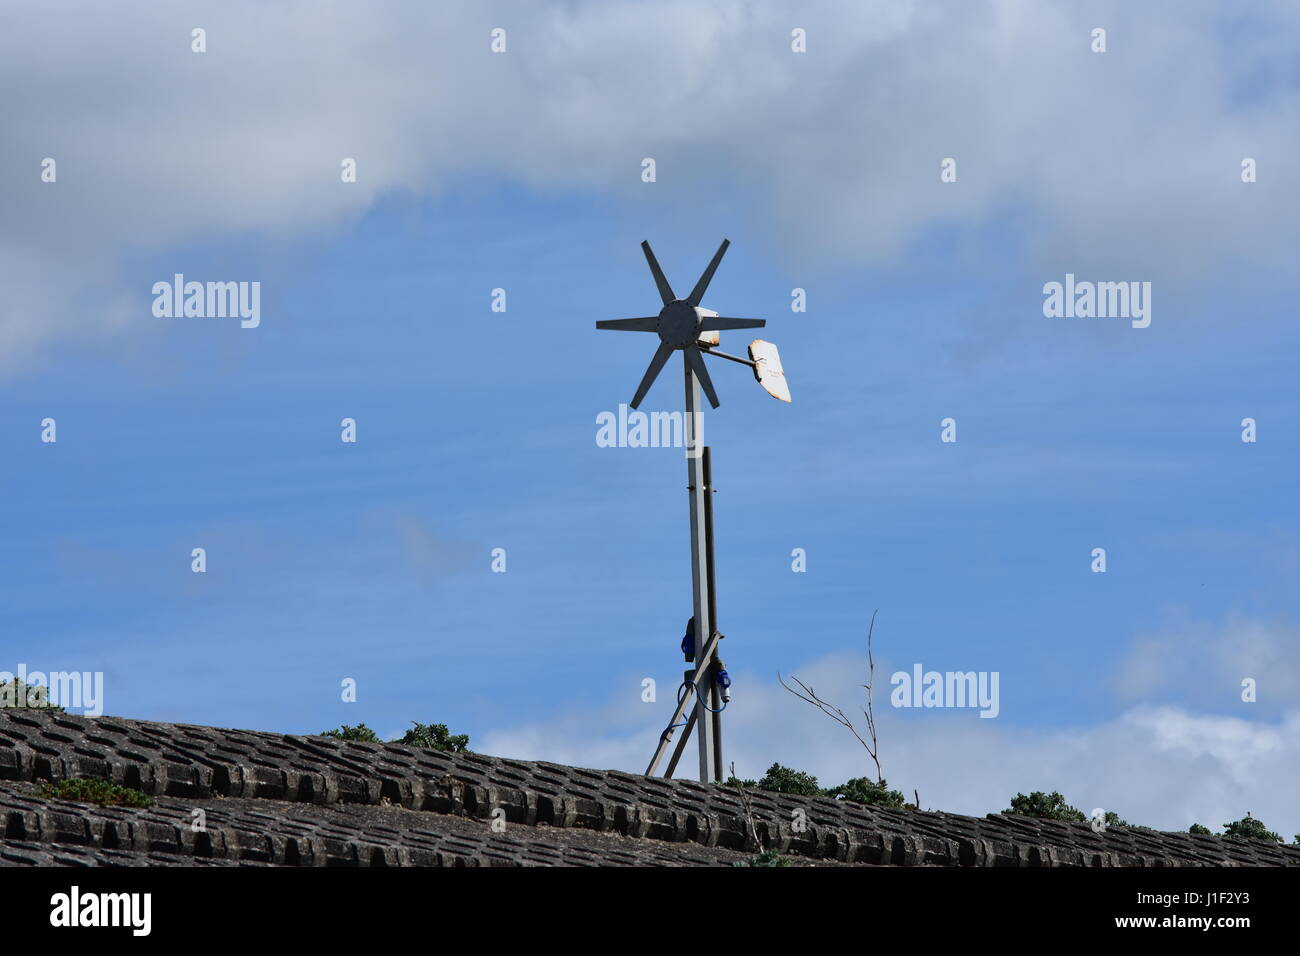 Domestic Wind Turbine at Snettisham Beach, Norfolk, UK - Stock Image